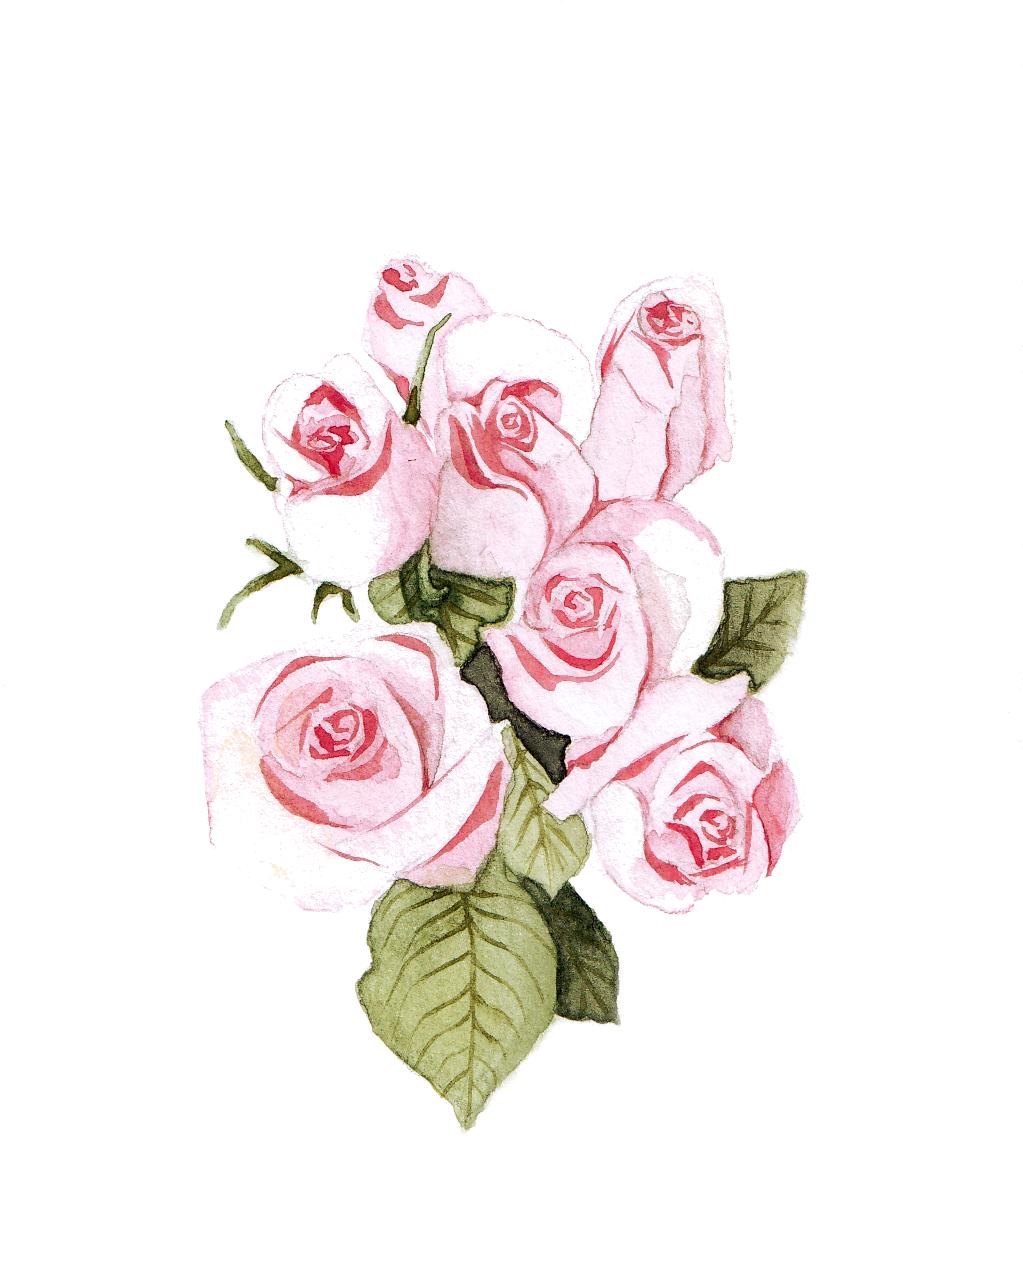 roses_final.jpg